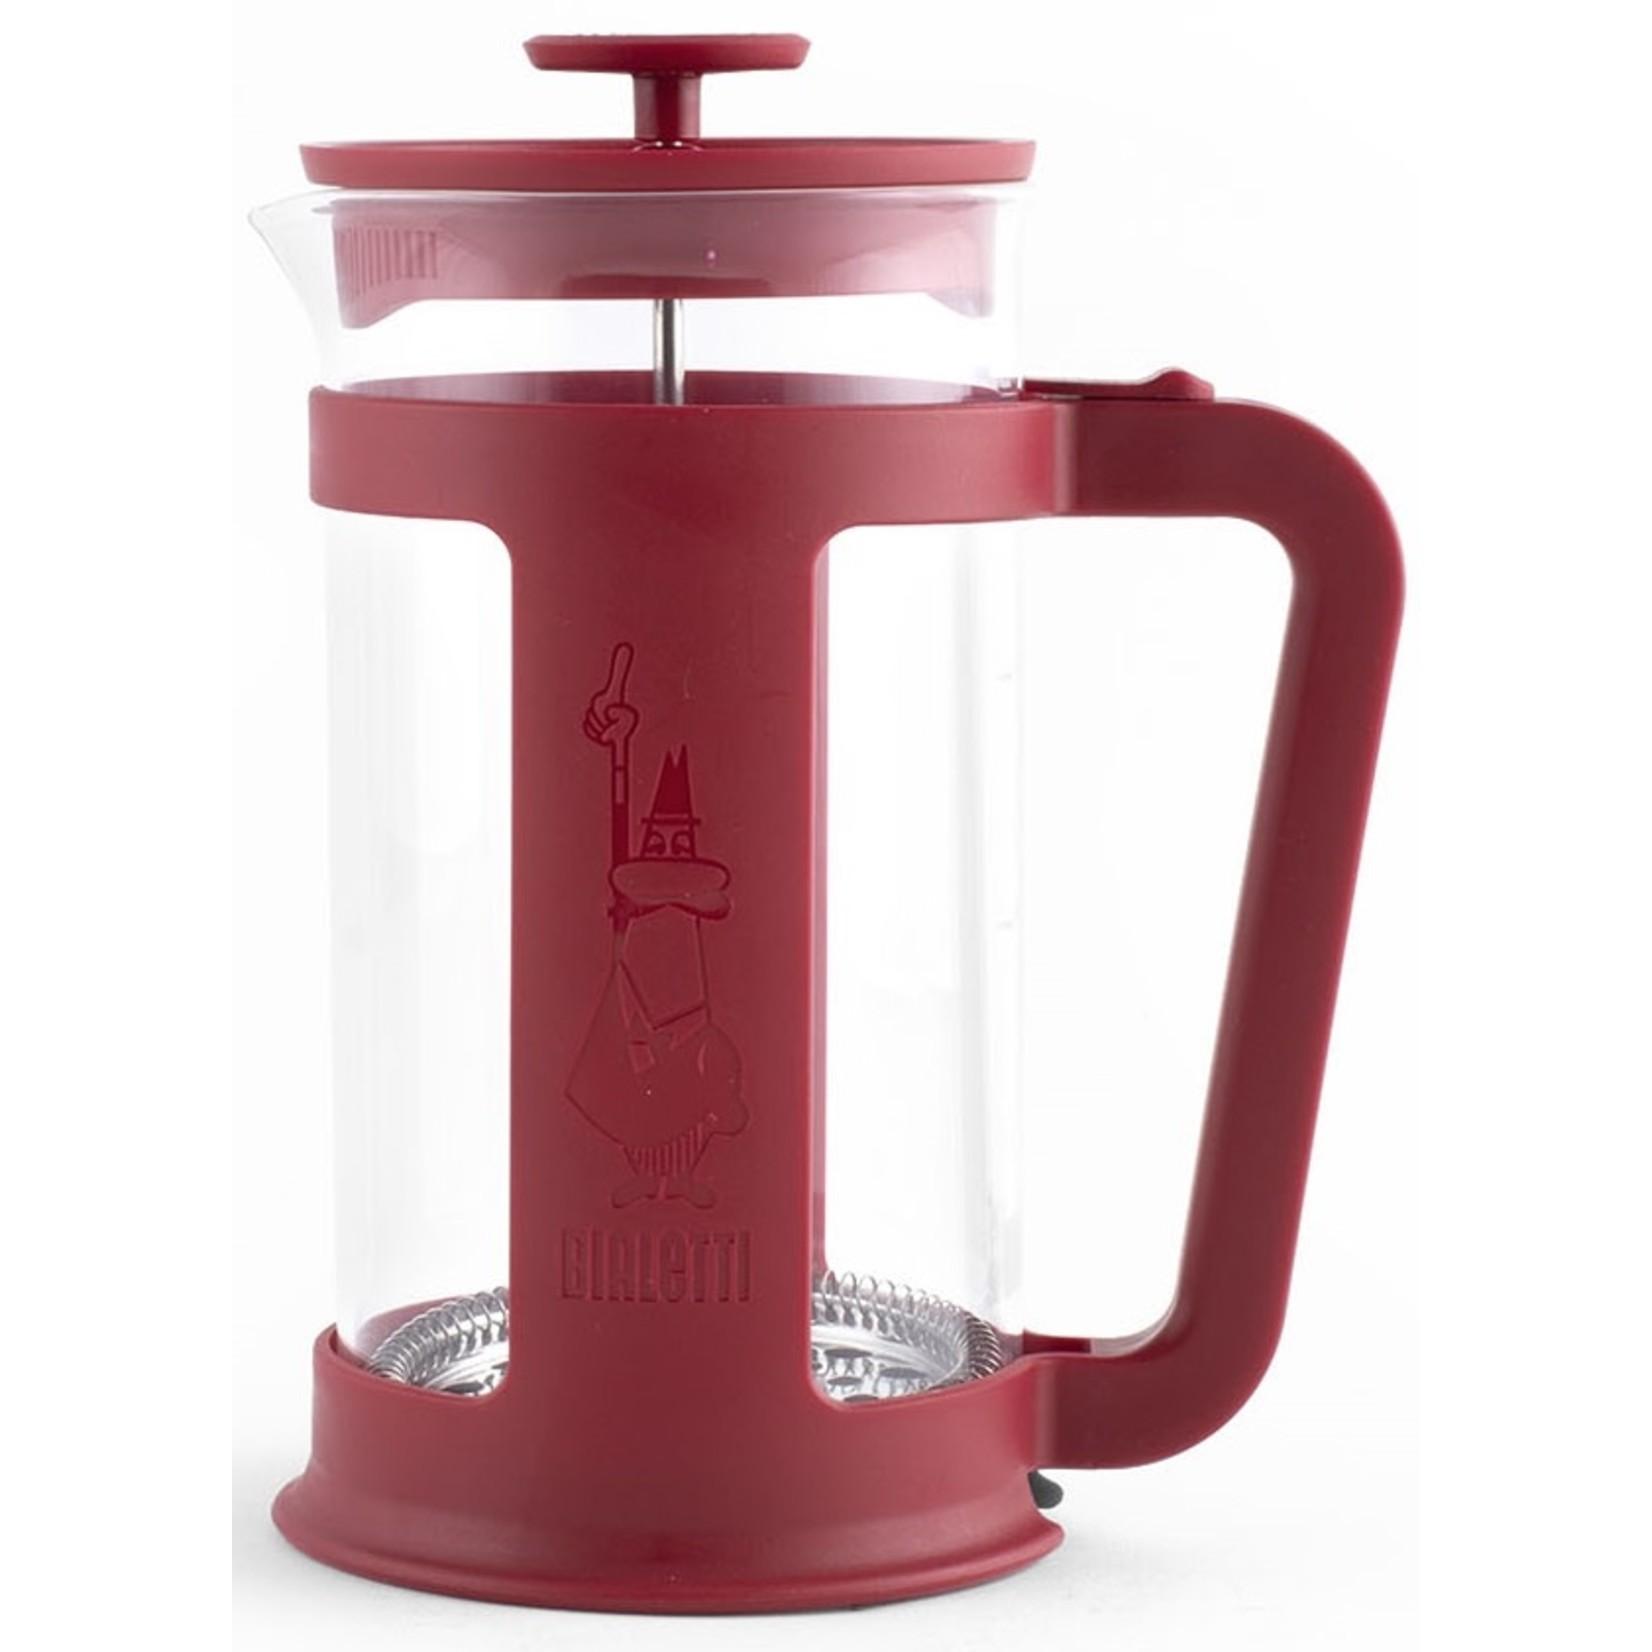 Bialetti Bialetti Caffetiere SMART rood 1 liter